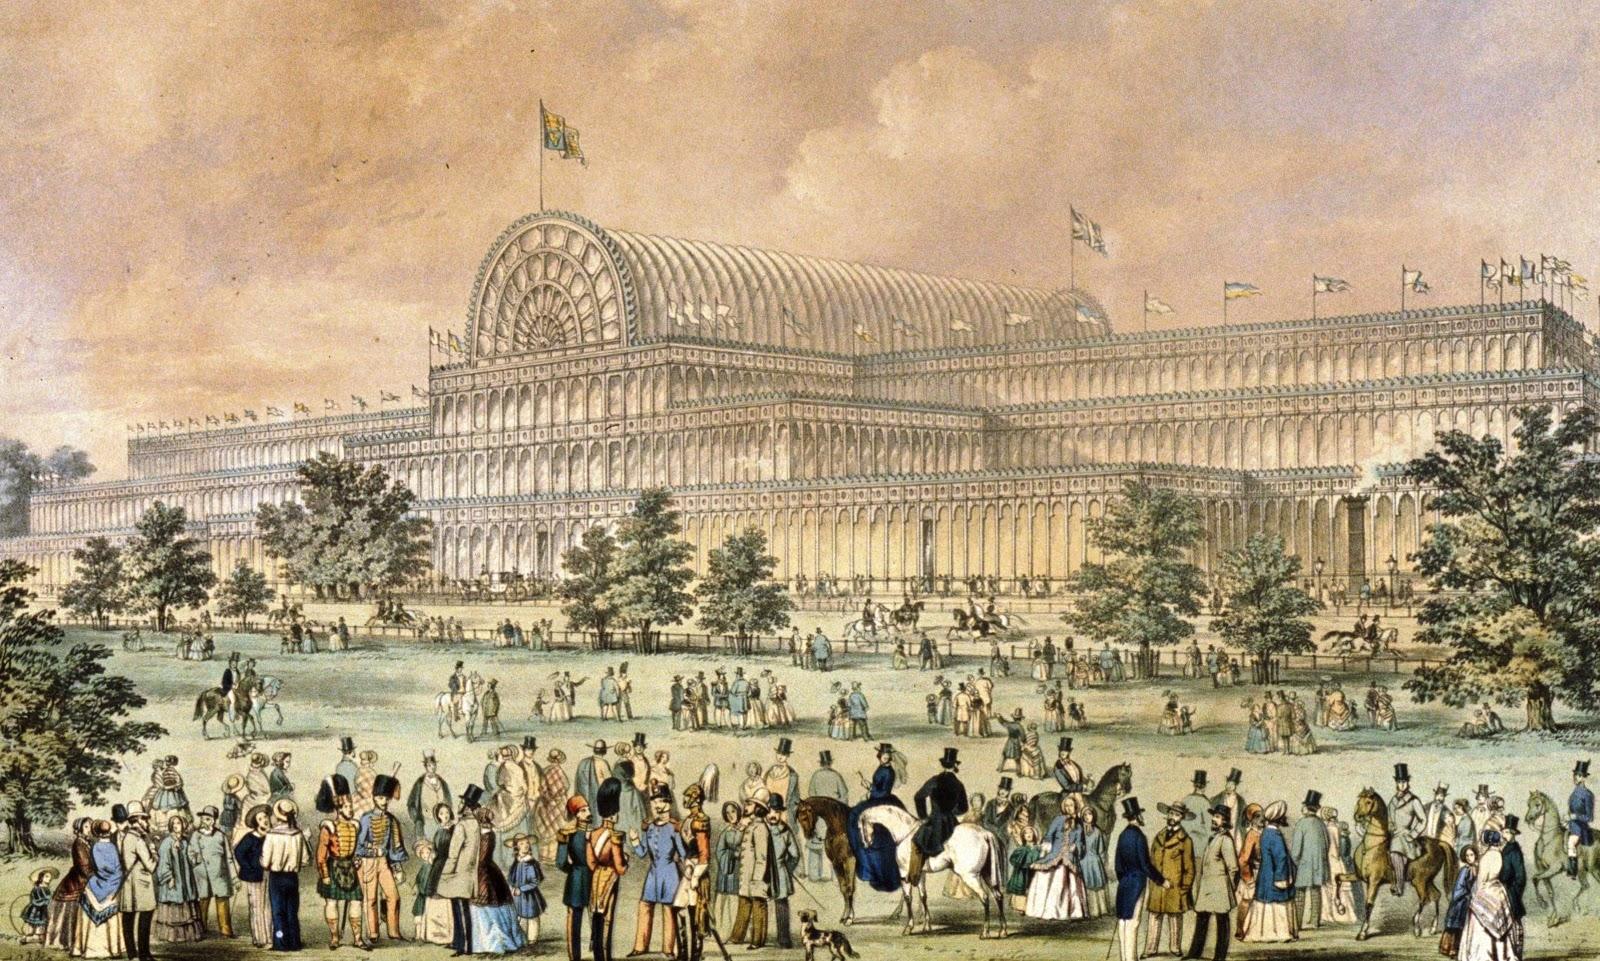 Joseph Paxton, Crystal Palace, 1851, Hyden Park, Londra.